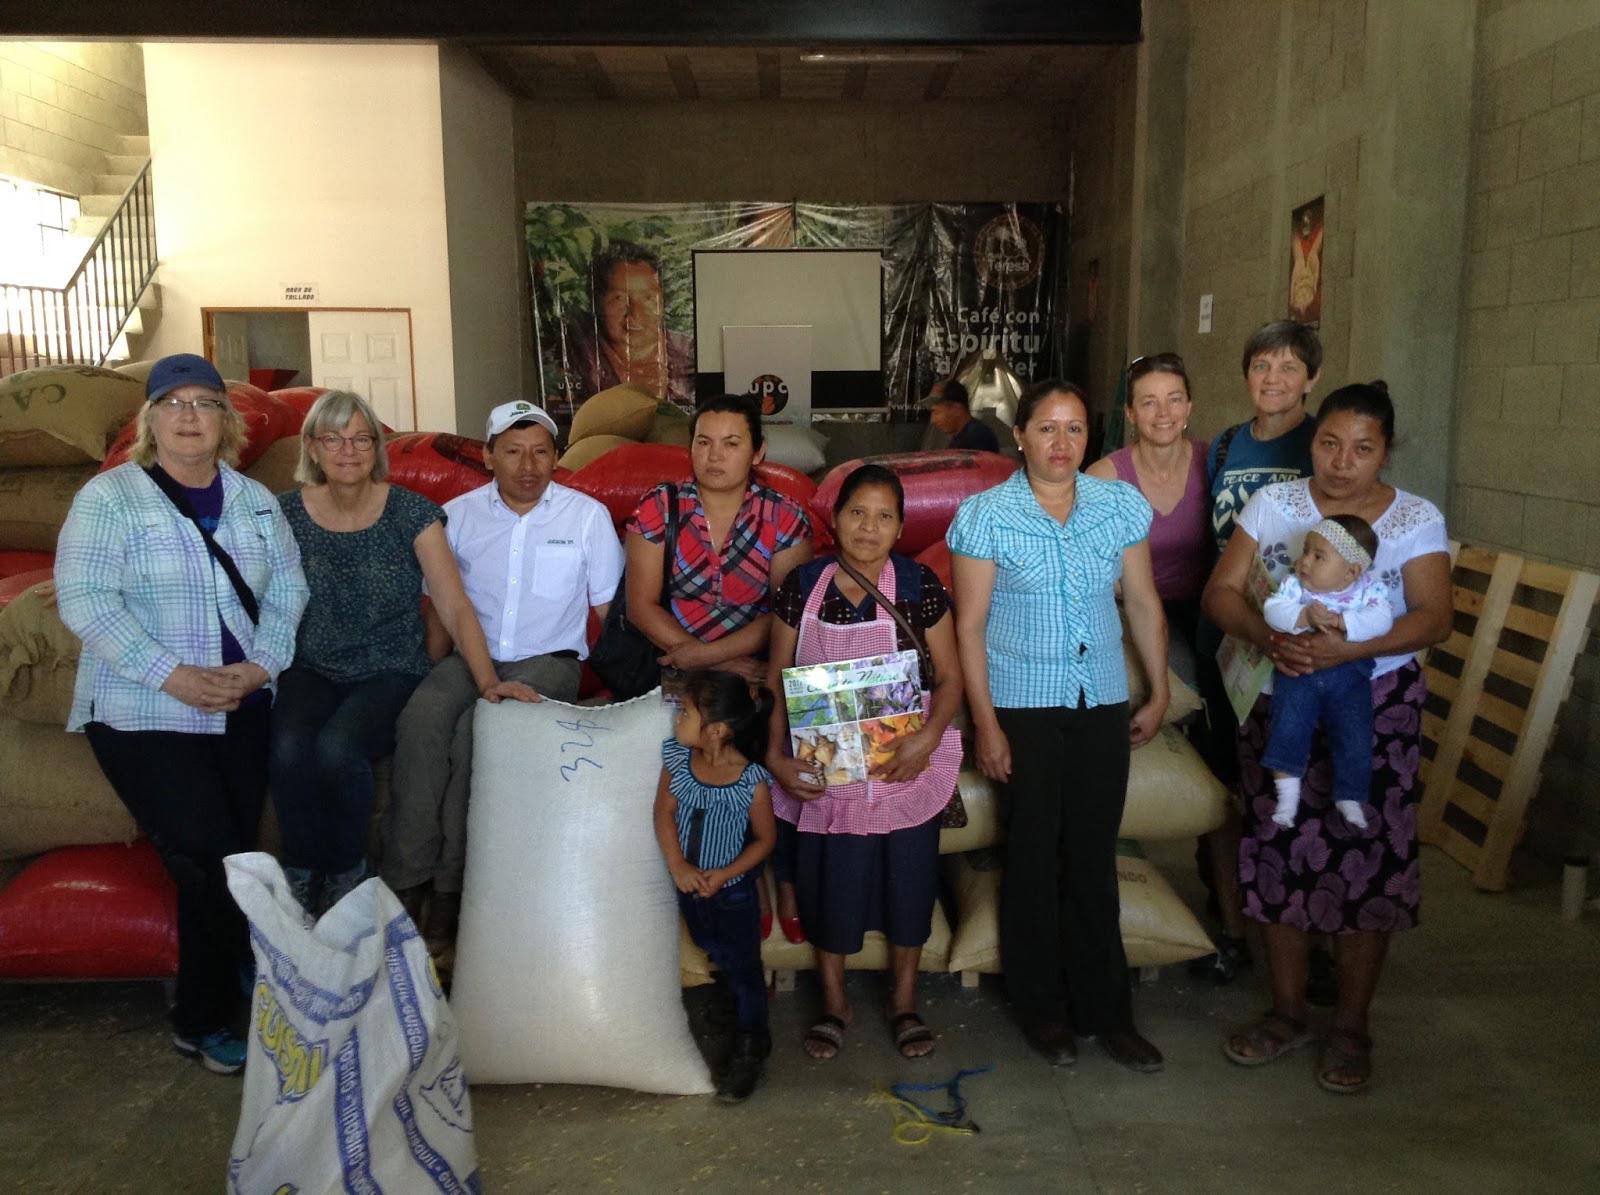 With the bags of coffee: Brenda, Jody, Jacinto, Orfa,Fabiana, Sonia, Sue, Donna, Maria Luz